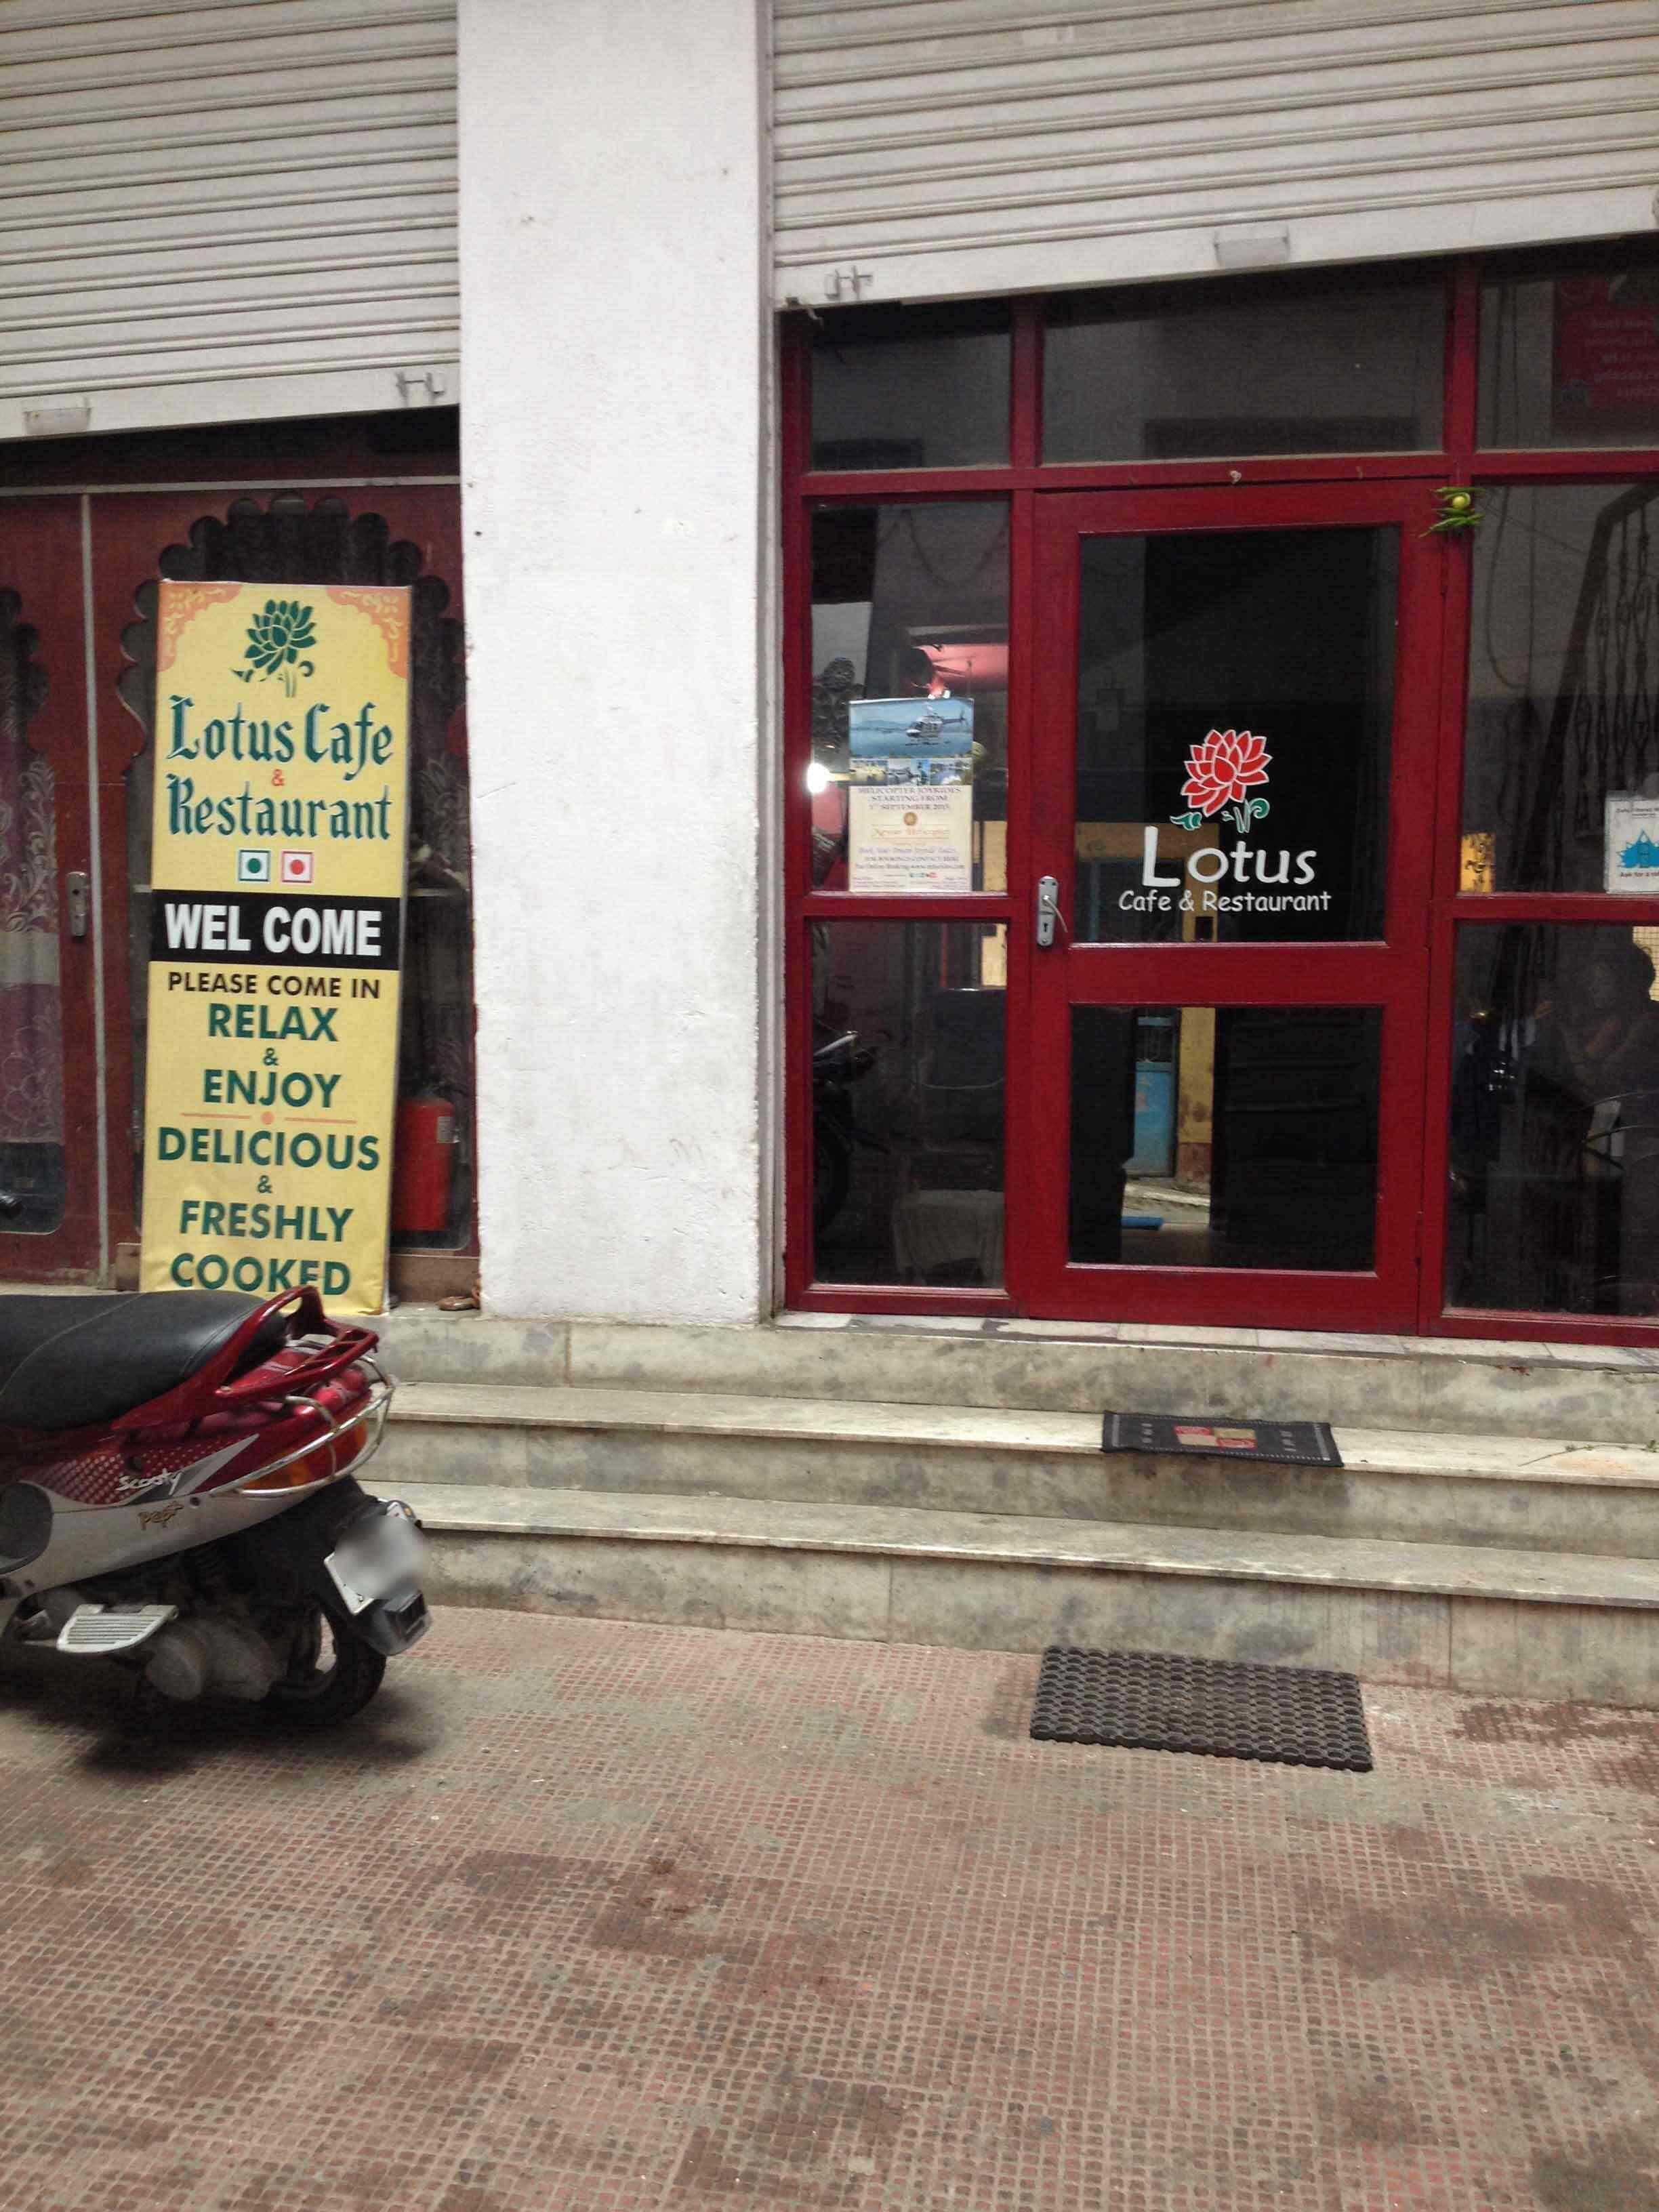 Lotus Restaurant - Chandpole - Udaipur Image